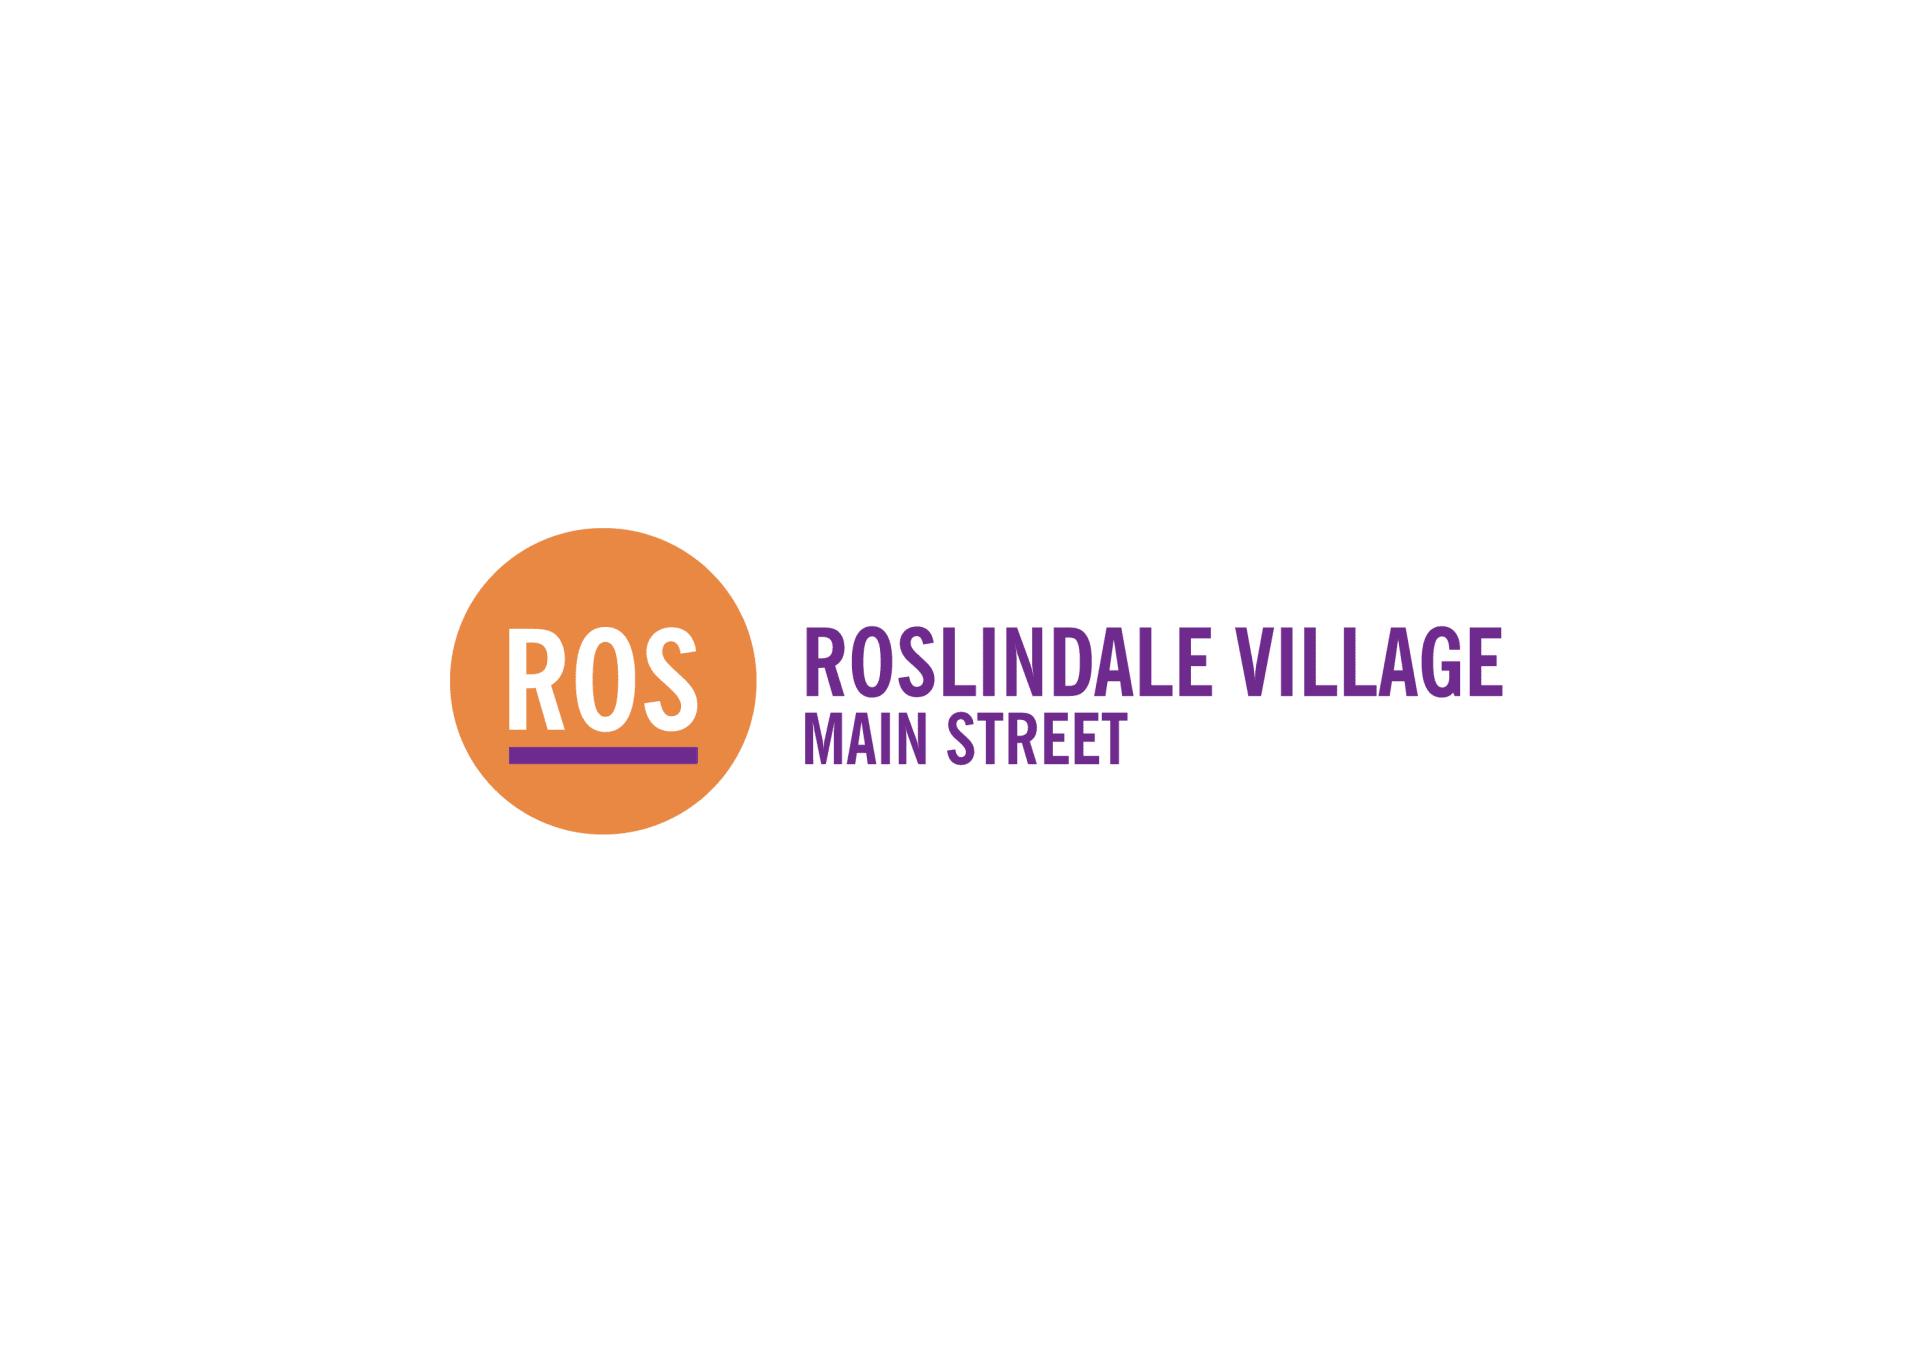 Roslindale Main Streets image